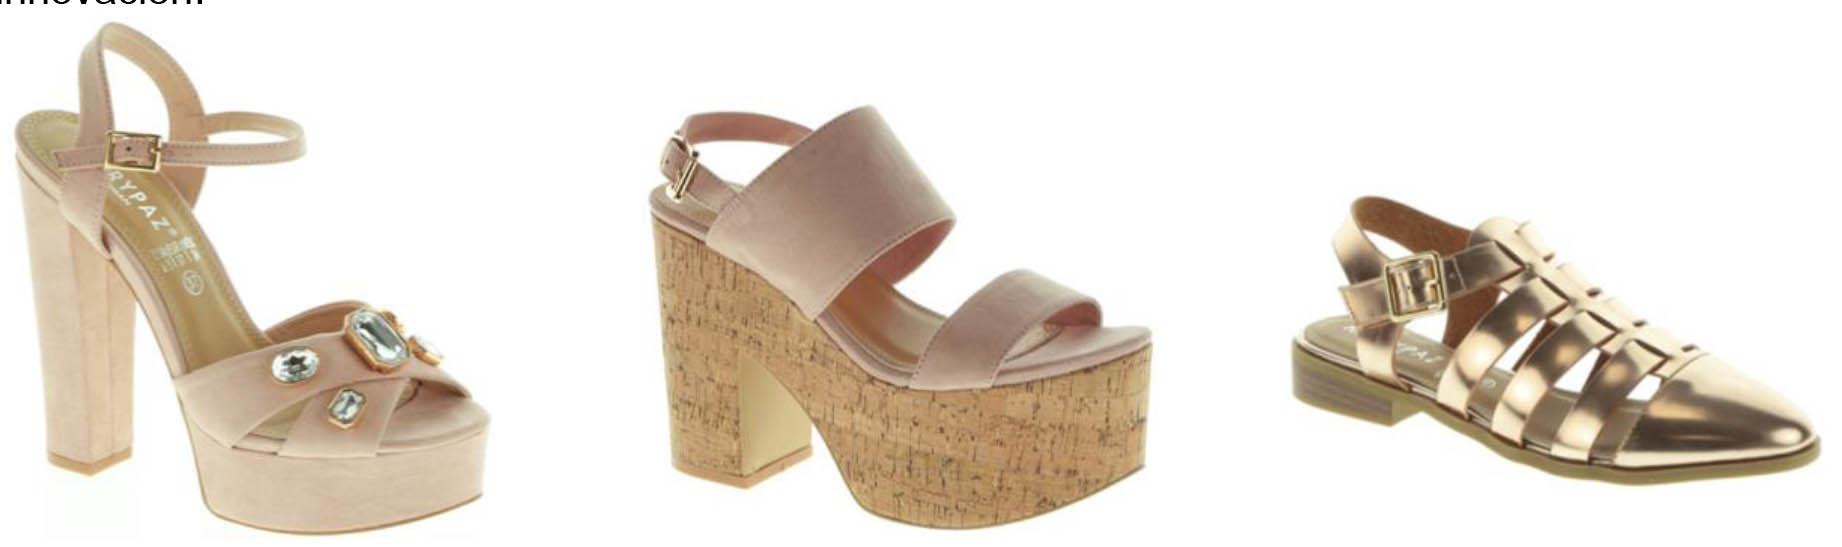 Zapatos sandalias Oro Dorados Beige Marypaz Marypaz TFKcJ3l1